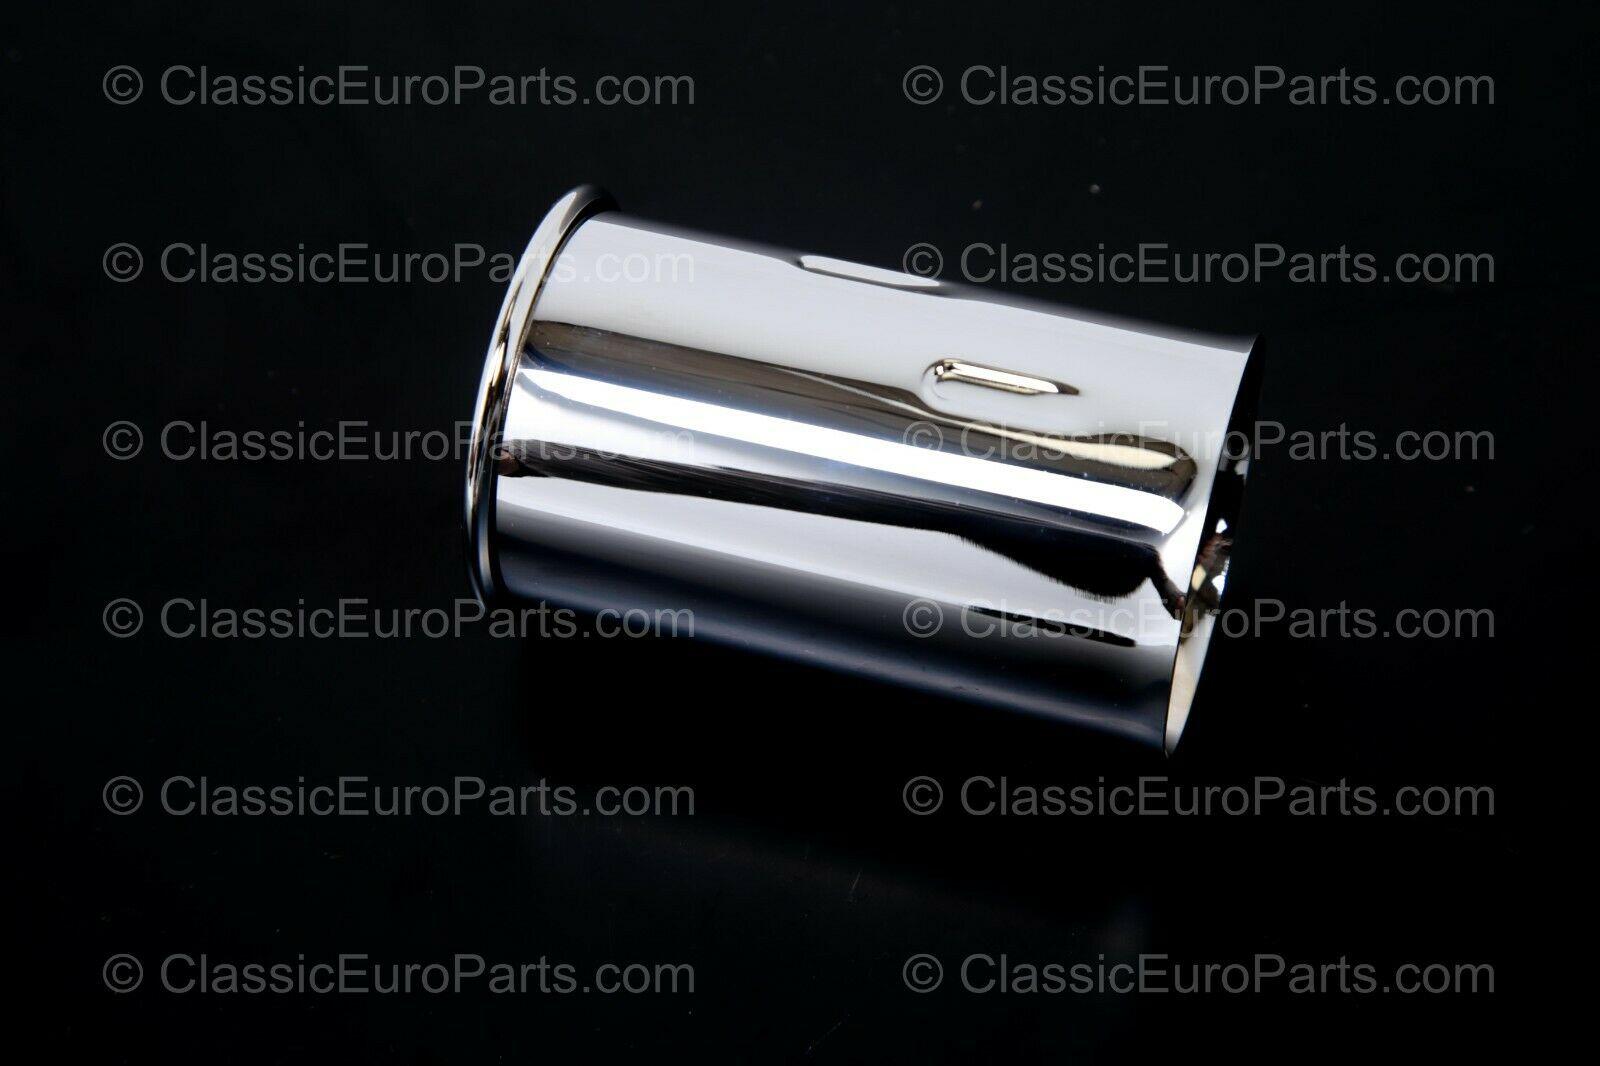 55 mm diameter chrome exhaust muffler tip for bmw cars